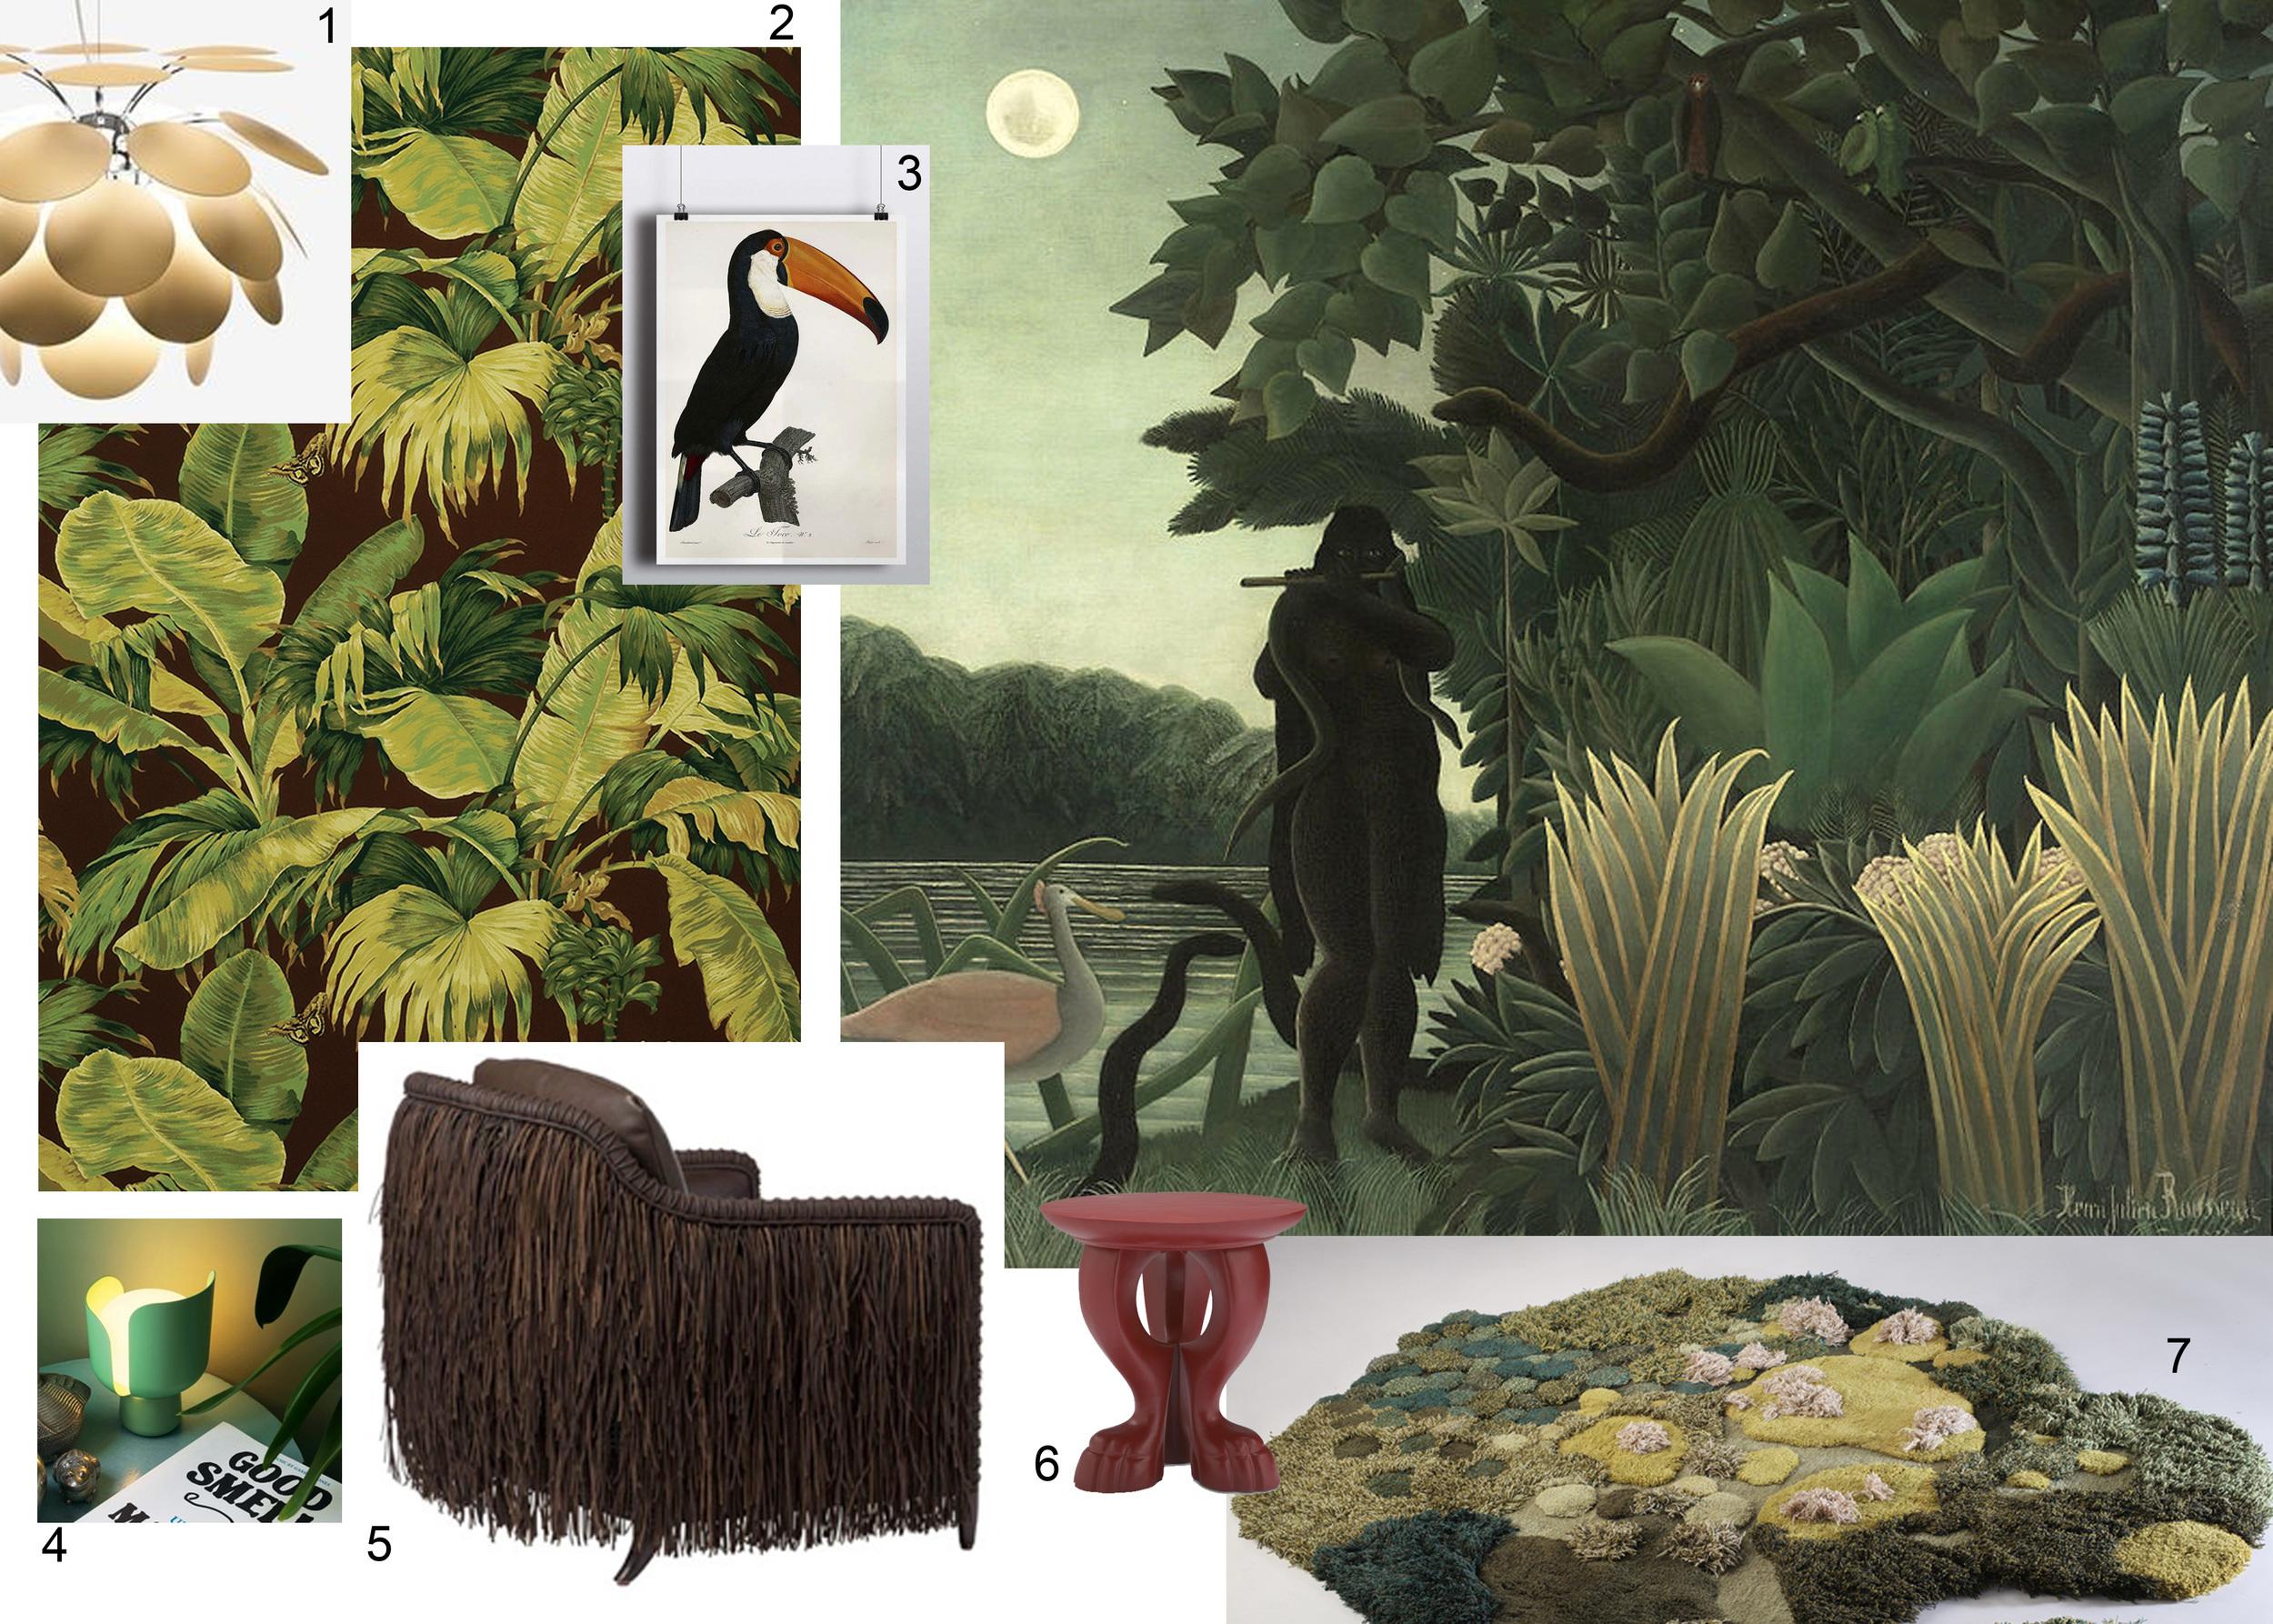 Painting: Henri Rousseau - The Snake Charmer 1907 - 1. Marset - 2. Pierre Frey - 3. Etsy - The Black Vinyl - 4. Fontana Arte - 5. Baker - 6. McGuire- 7. Alexandra Kehayoglou